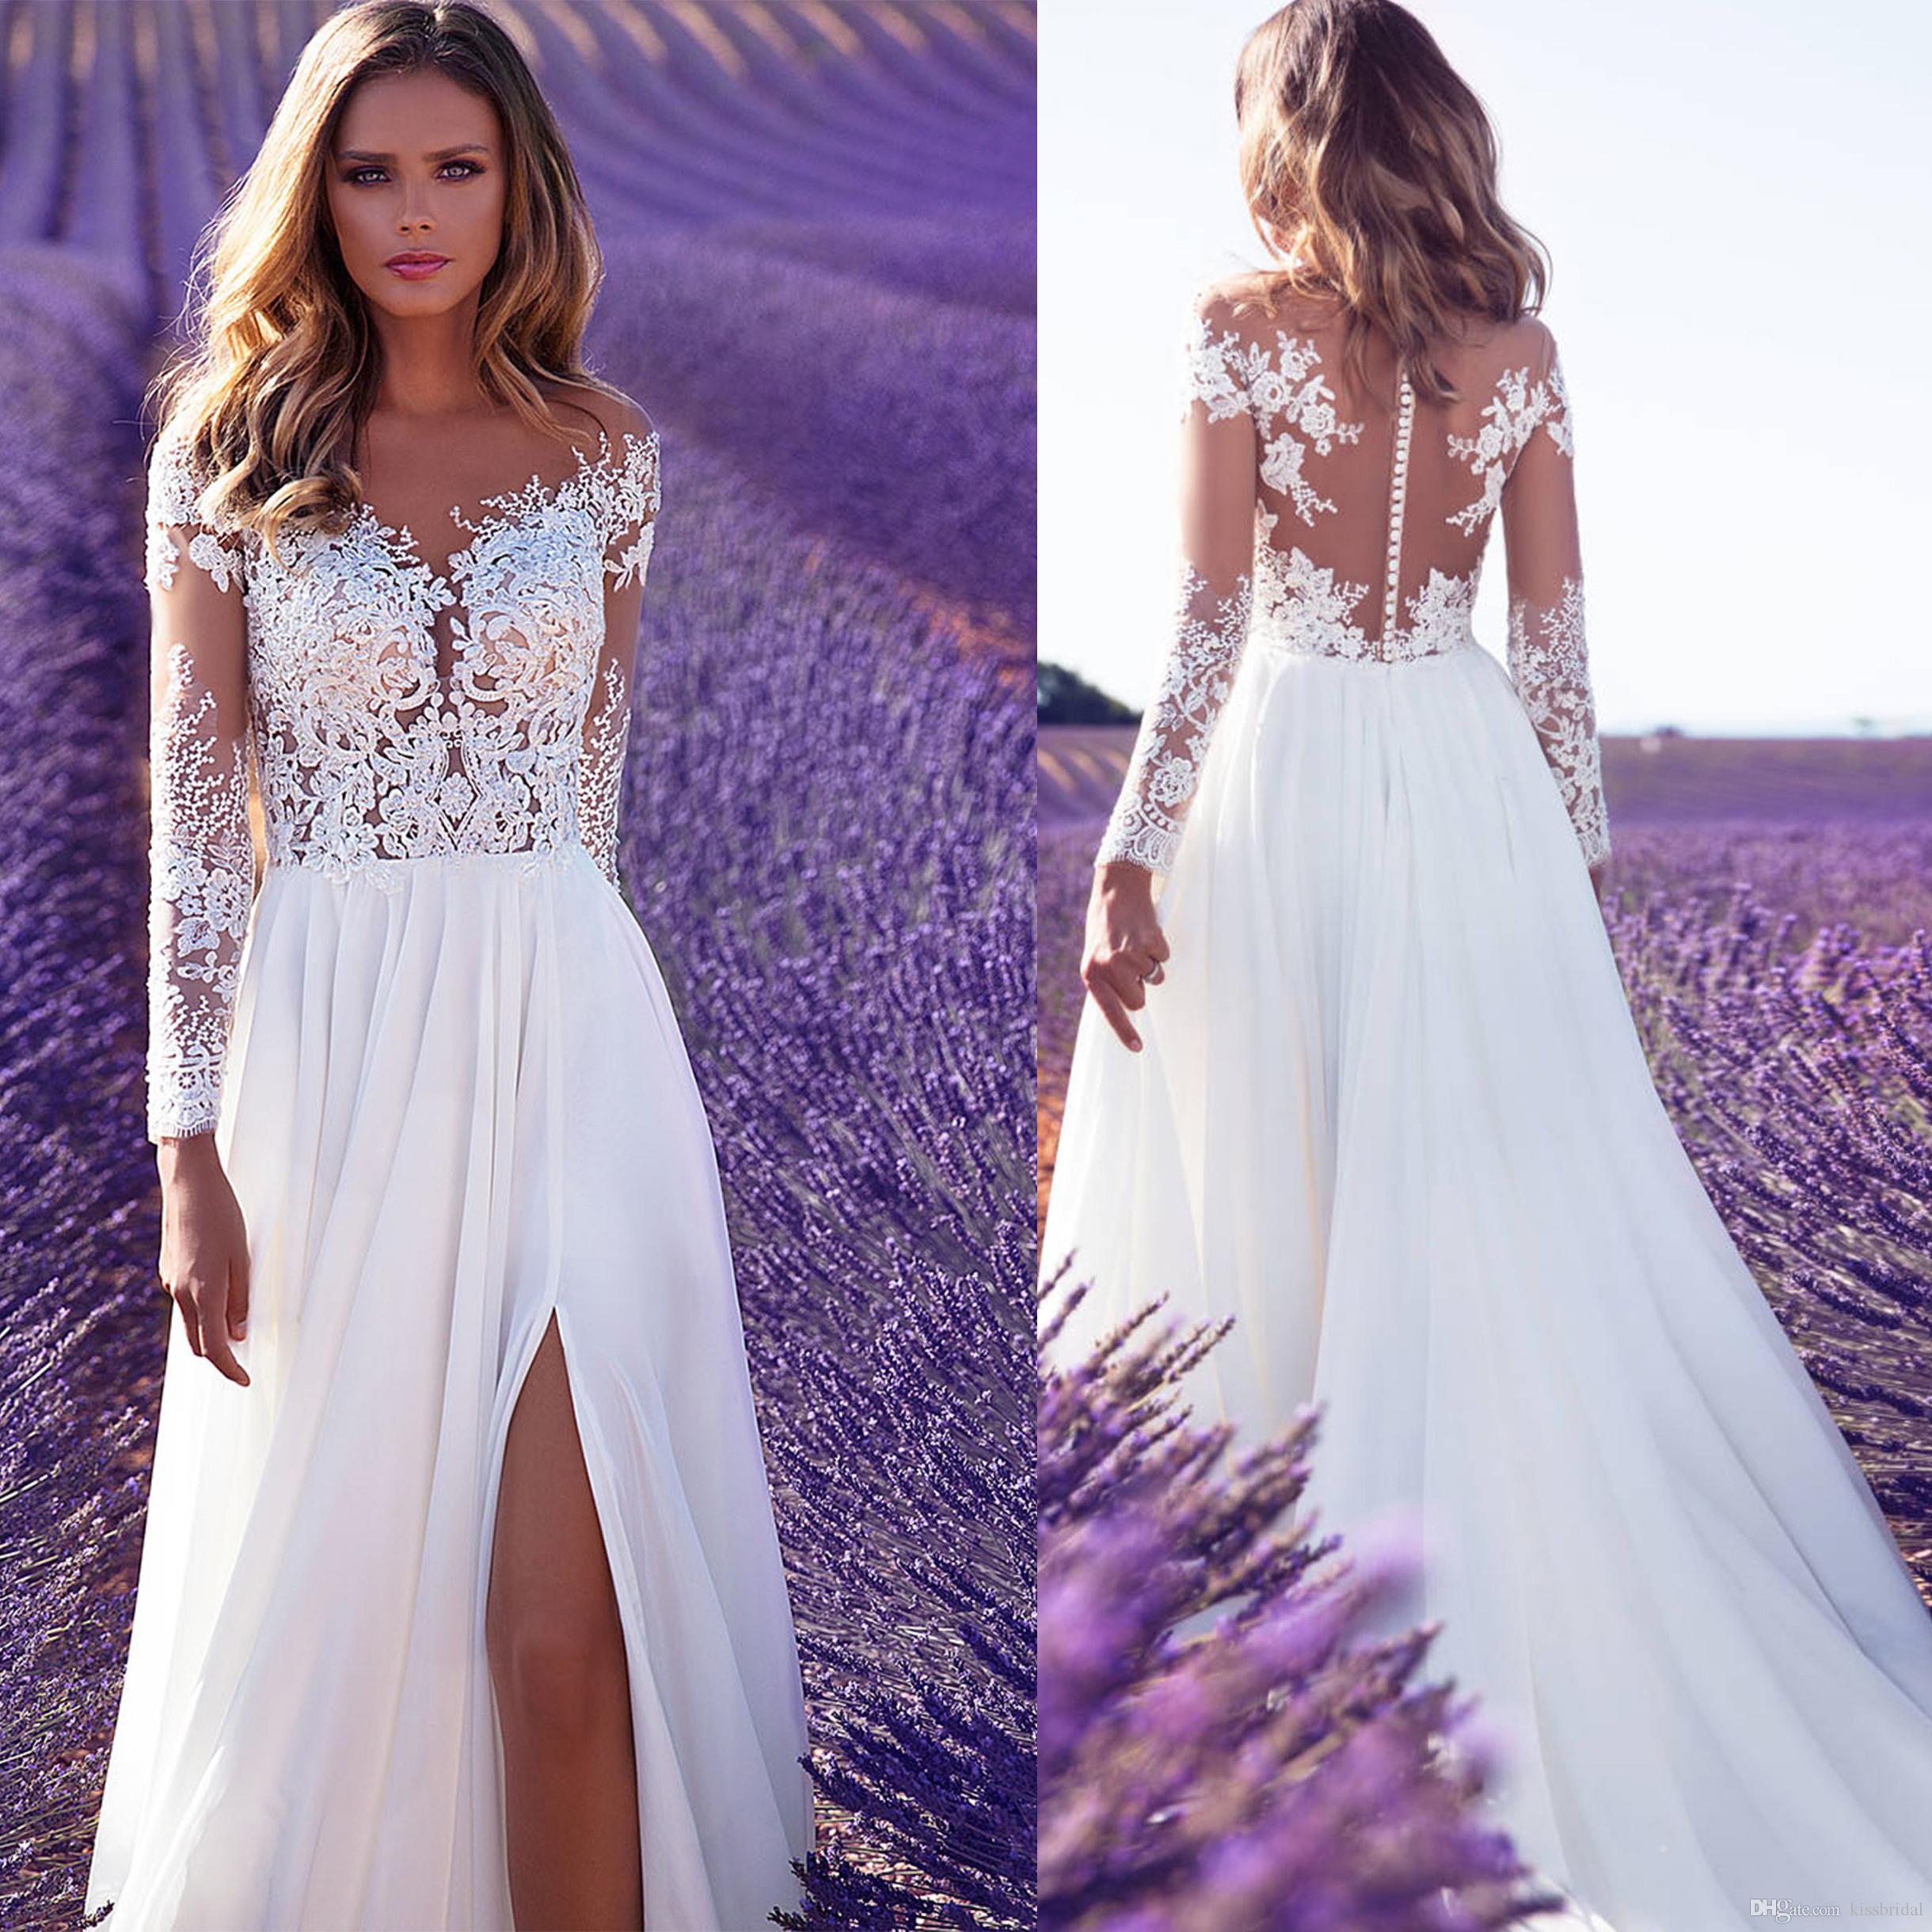 2019 High Split Lace Chiffon Wedding Dresses Sheath Sheer Illusion Bridal Formal Gown Summer Beach Long Sleeve Milla Nova Wedding Dress